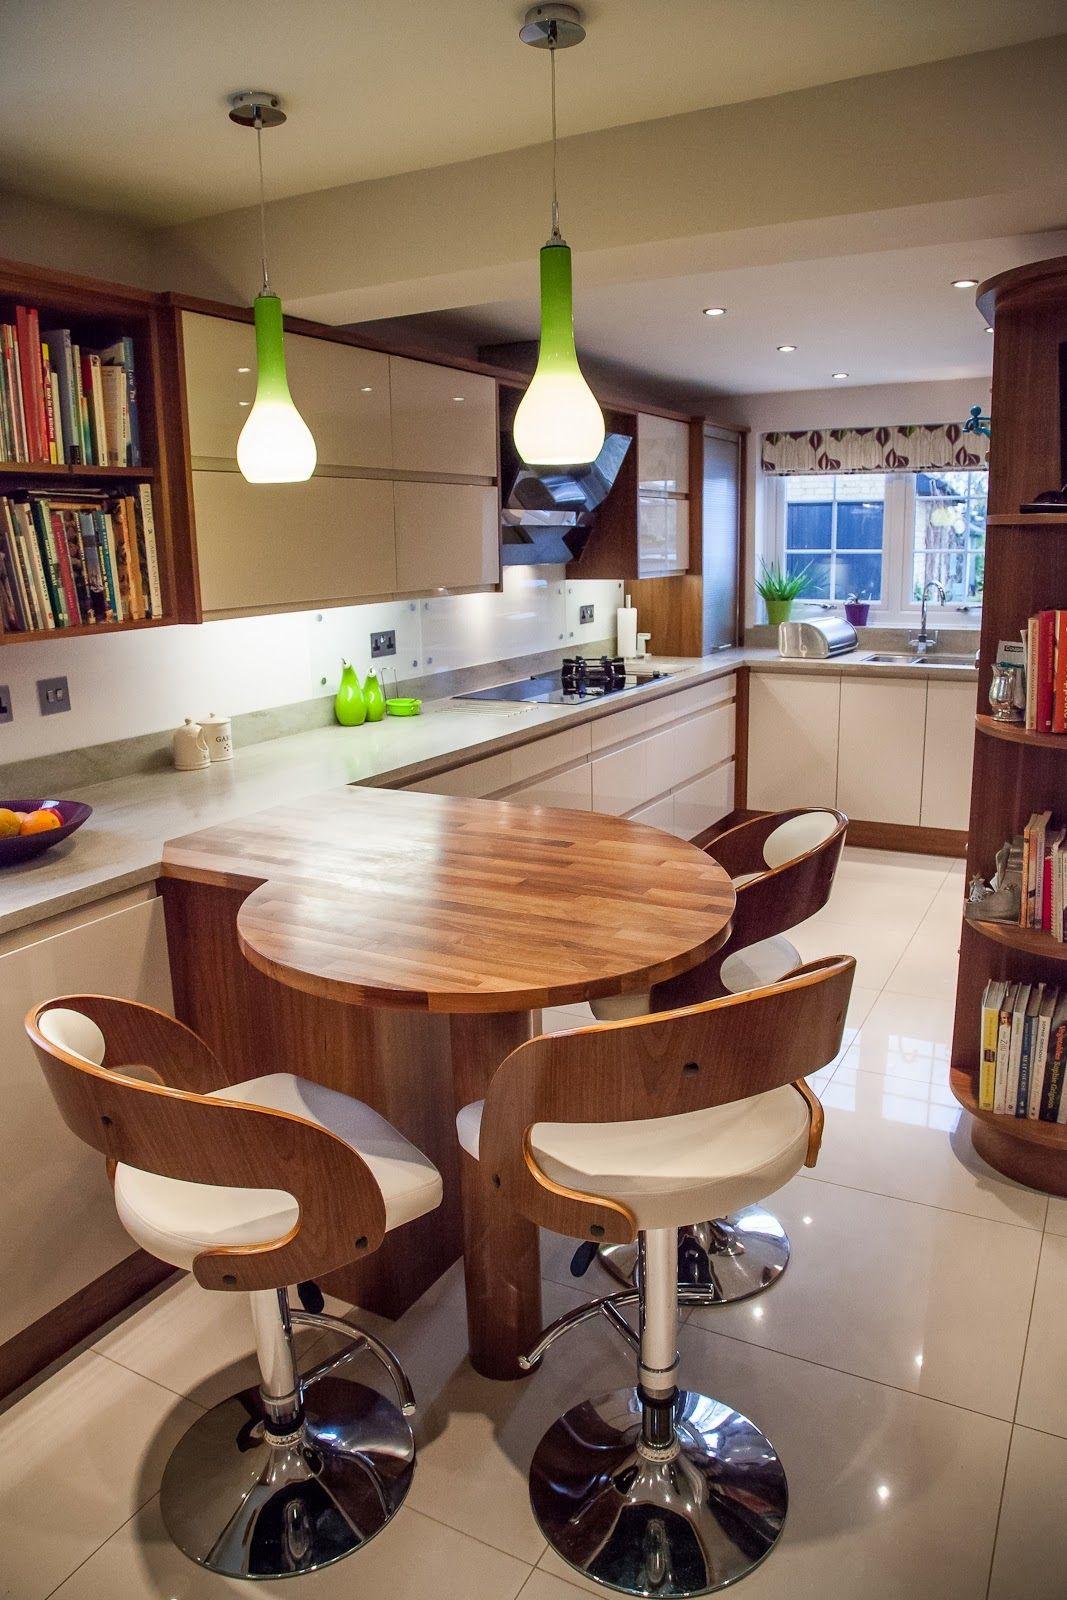 Wooden Round Breakfast Bar Situating Under Lime Green Modern